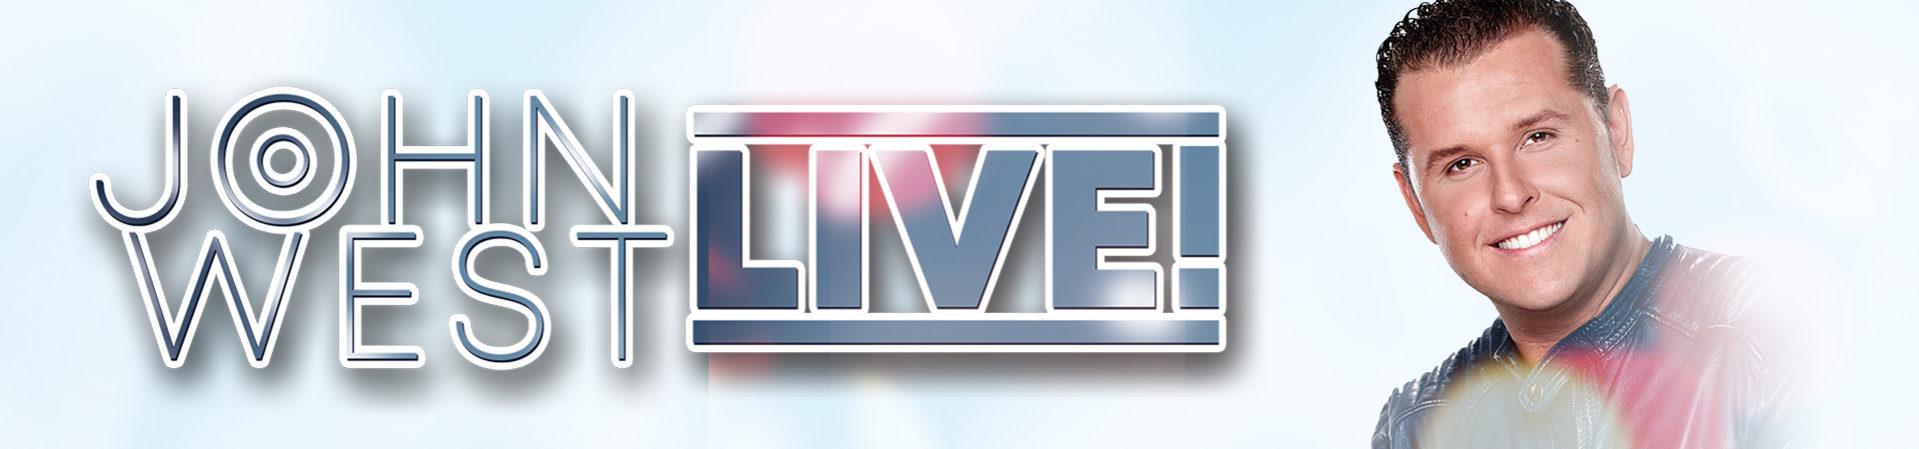 John West Live!